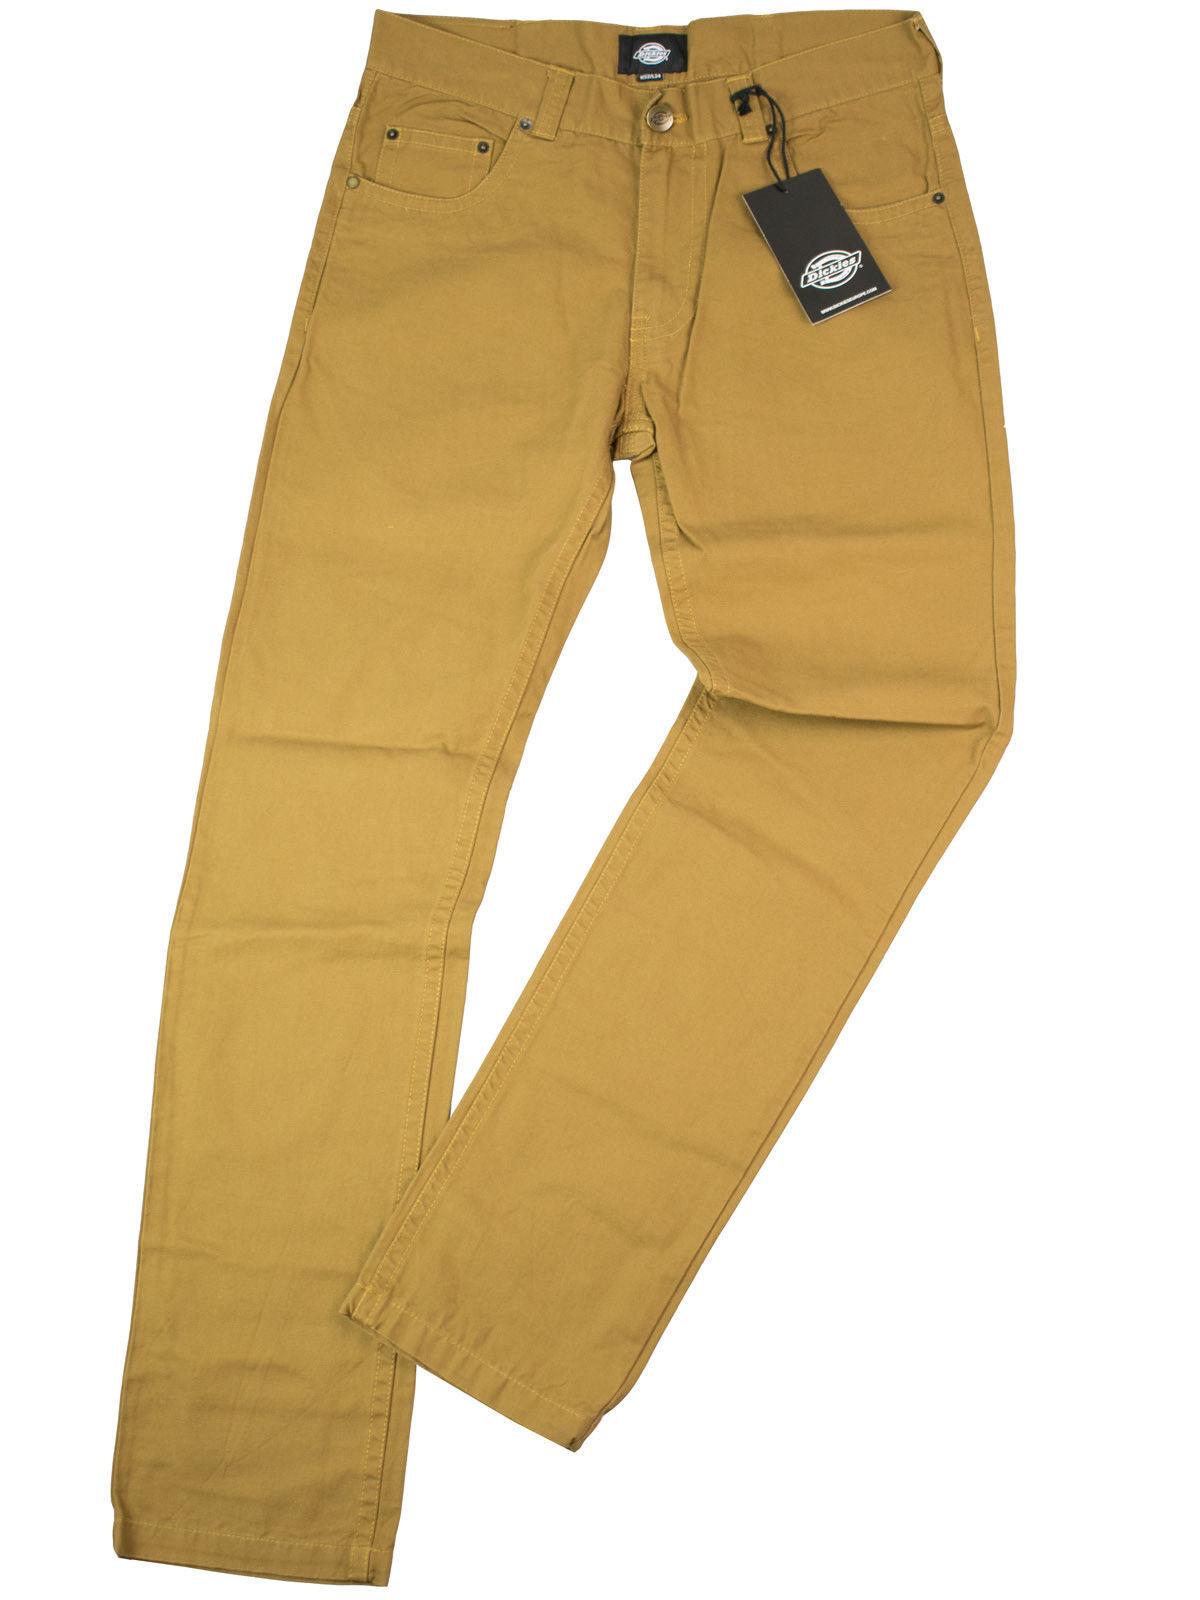 Dickies Pantaloni Alamo 5 Pocket CARGO JEANS JEANS JEANS OCRA MarroneeE ROCKABILLY 5049 b3989f